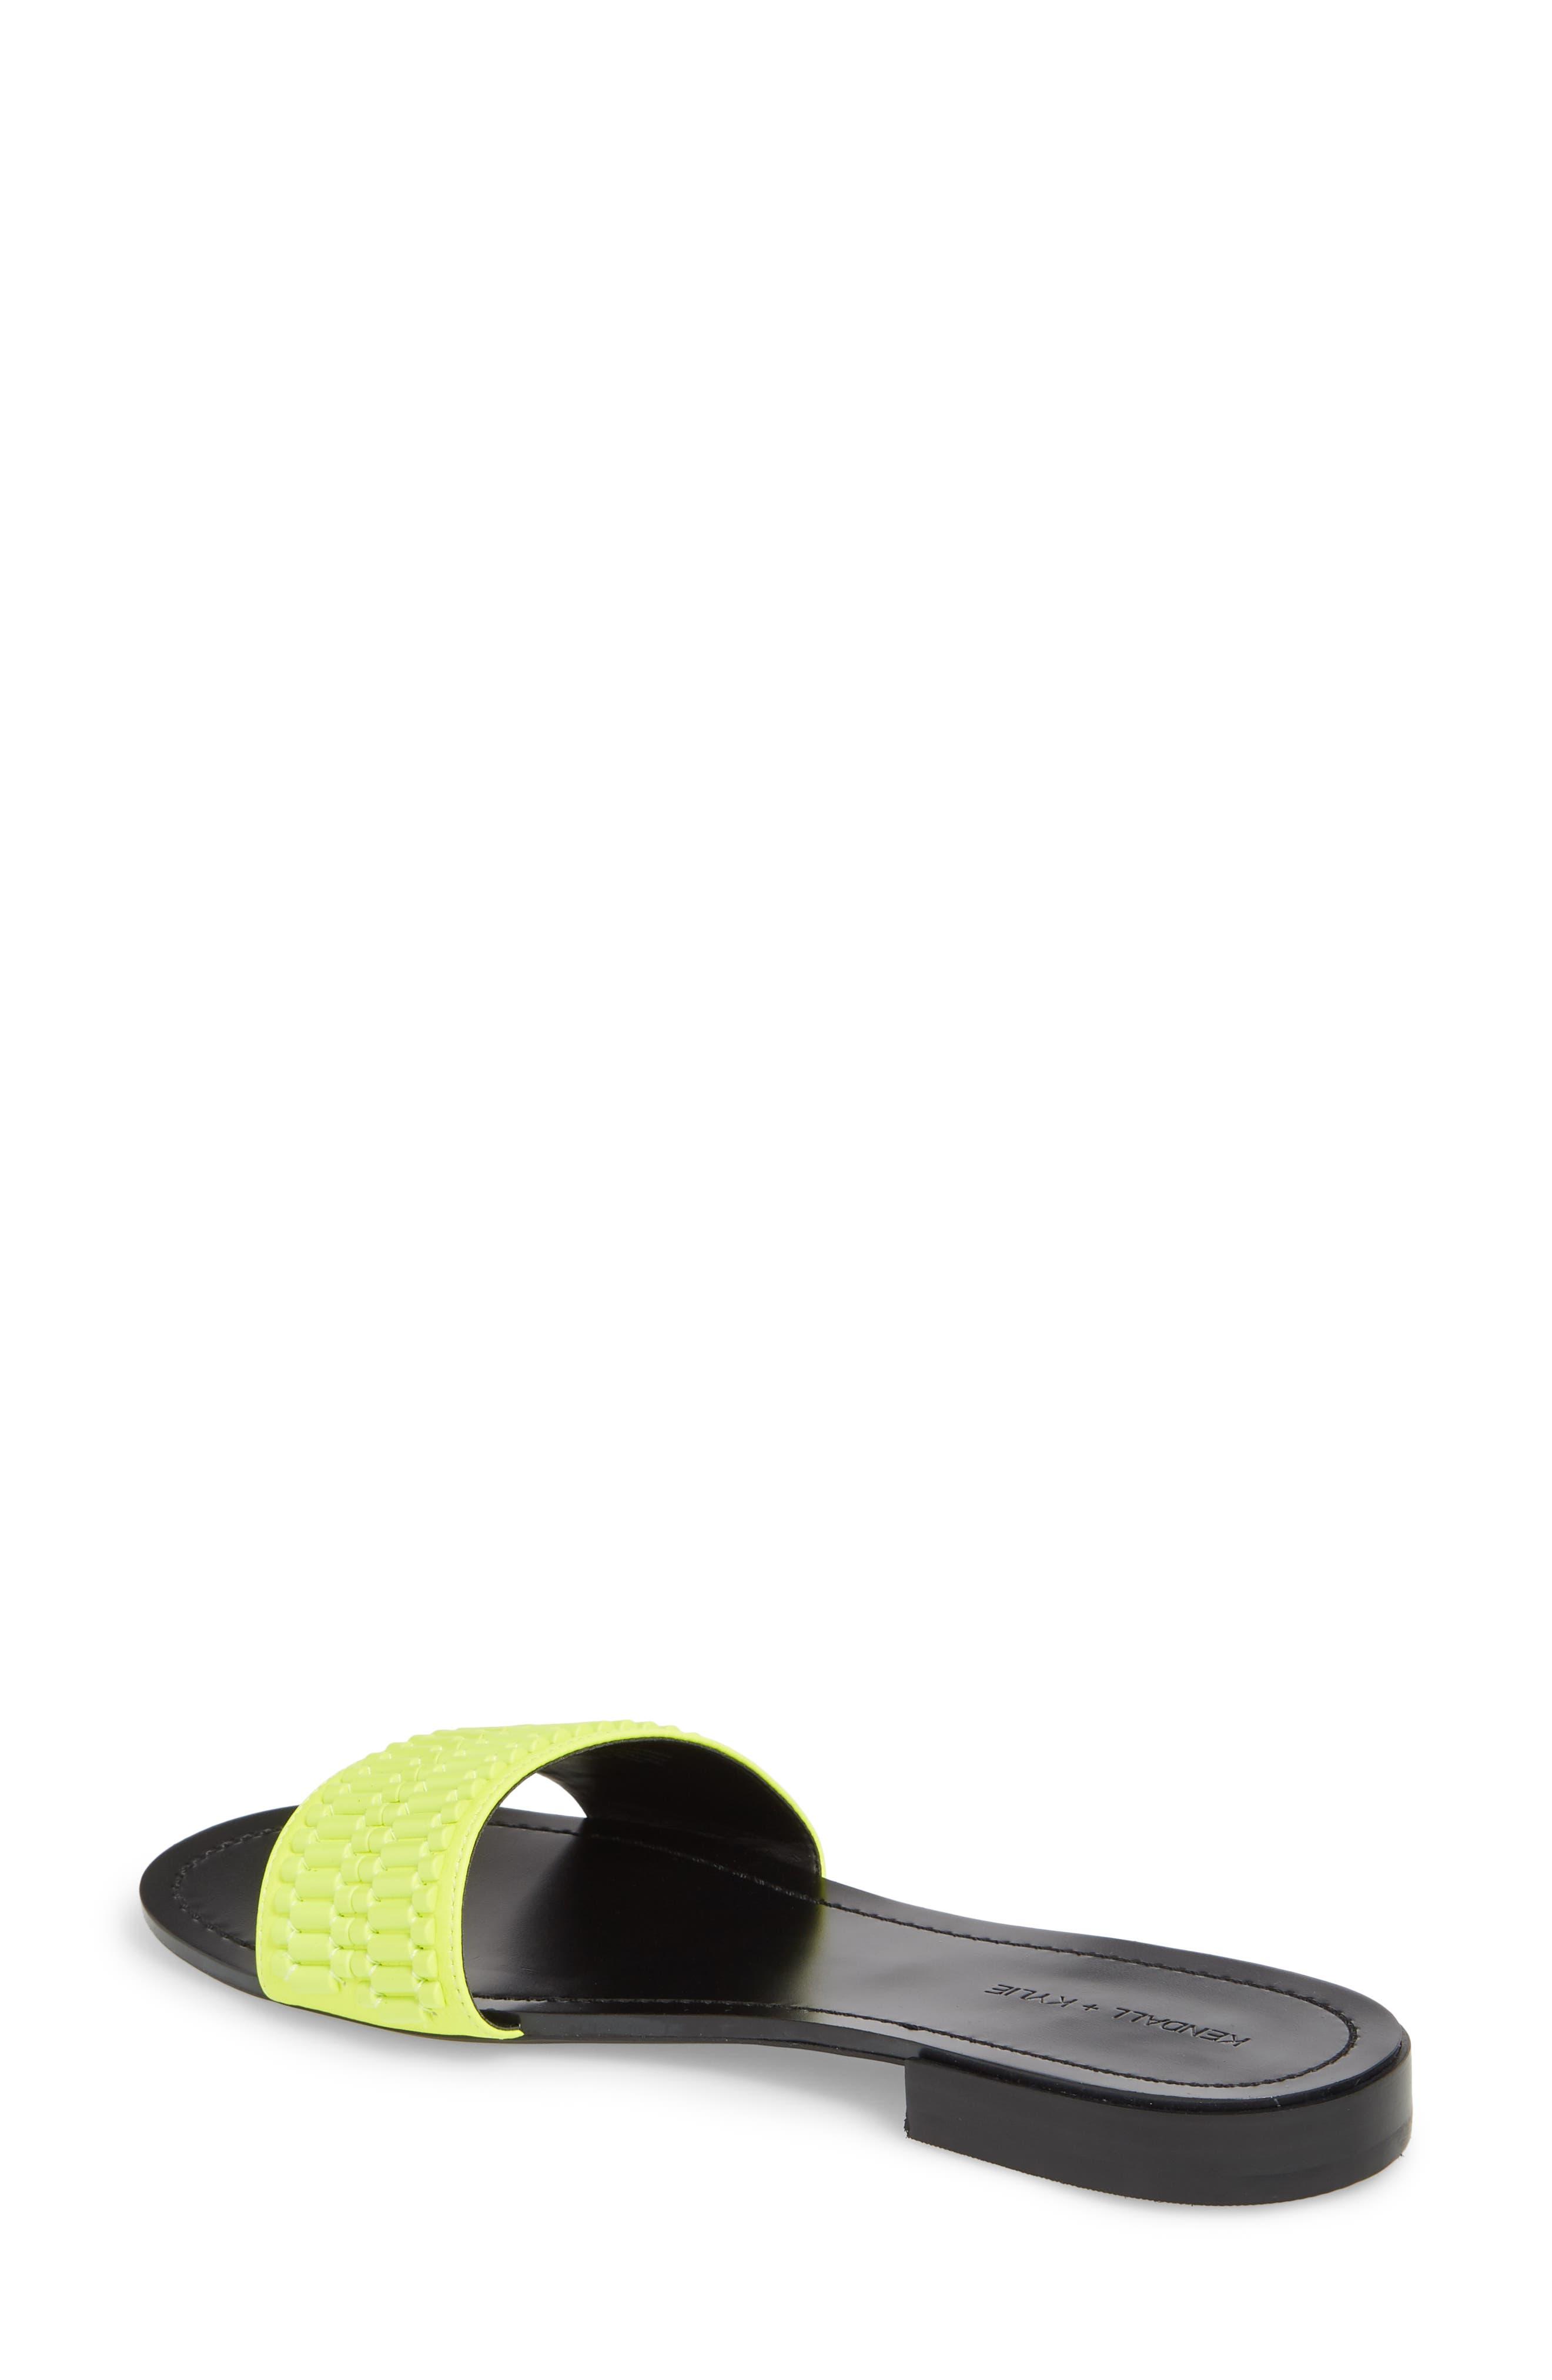 Kennedy Slide Sandal,                             Alternate thumbnail 2, color,                             FLUORESCENT YELLOW/ YELLOW